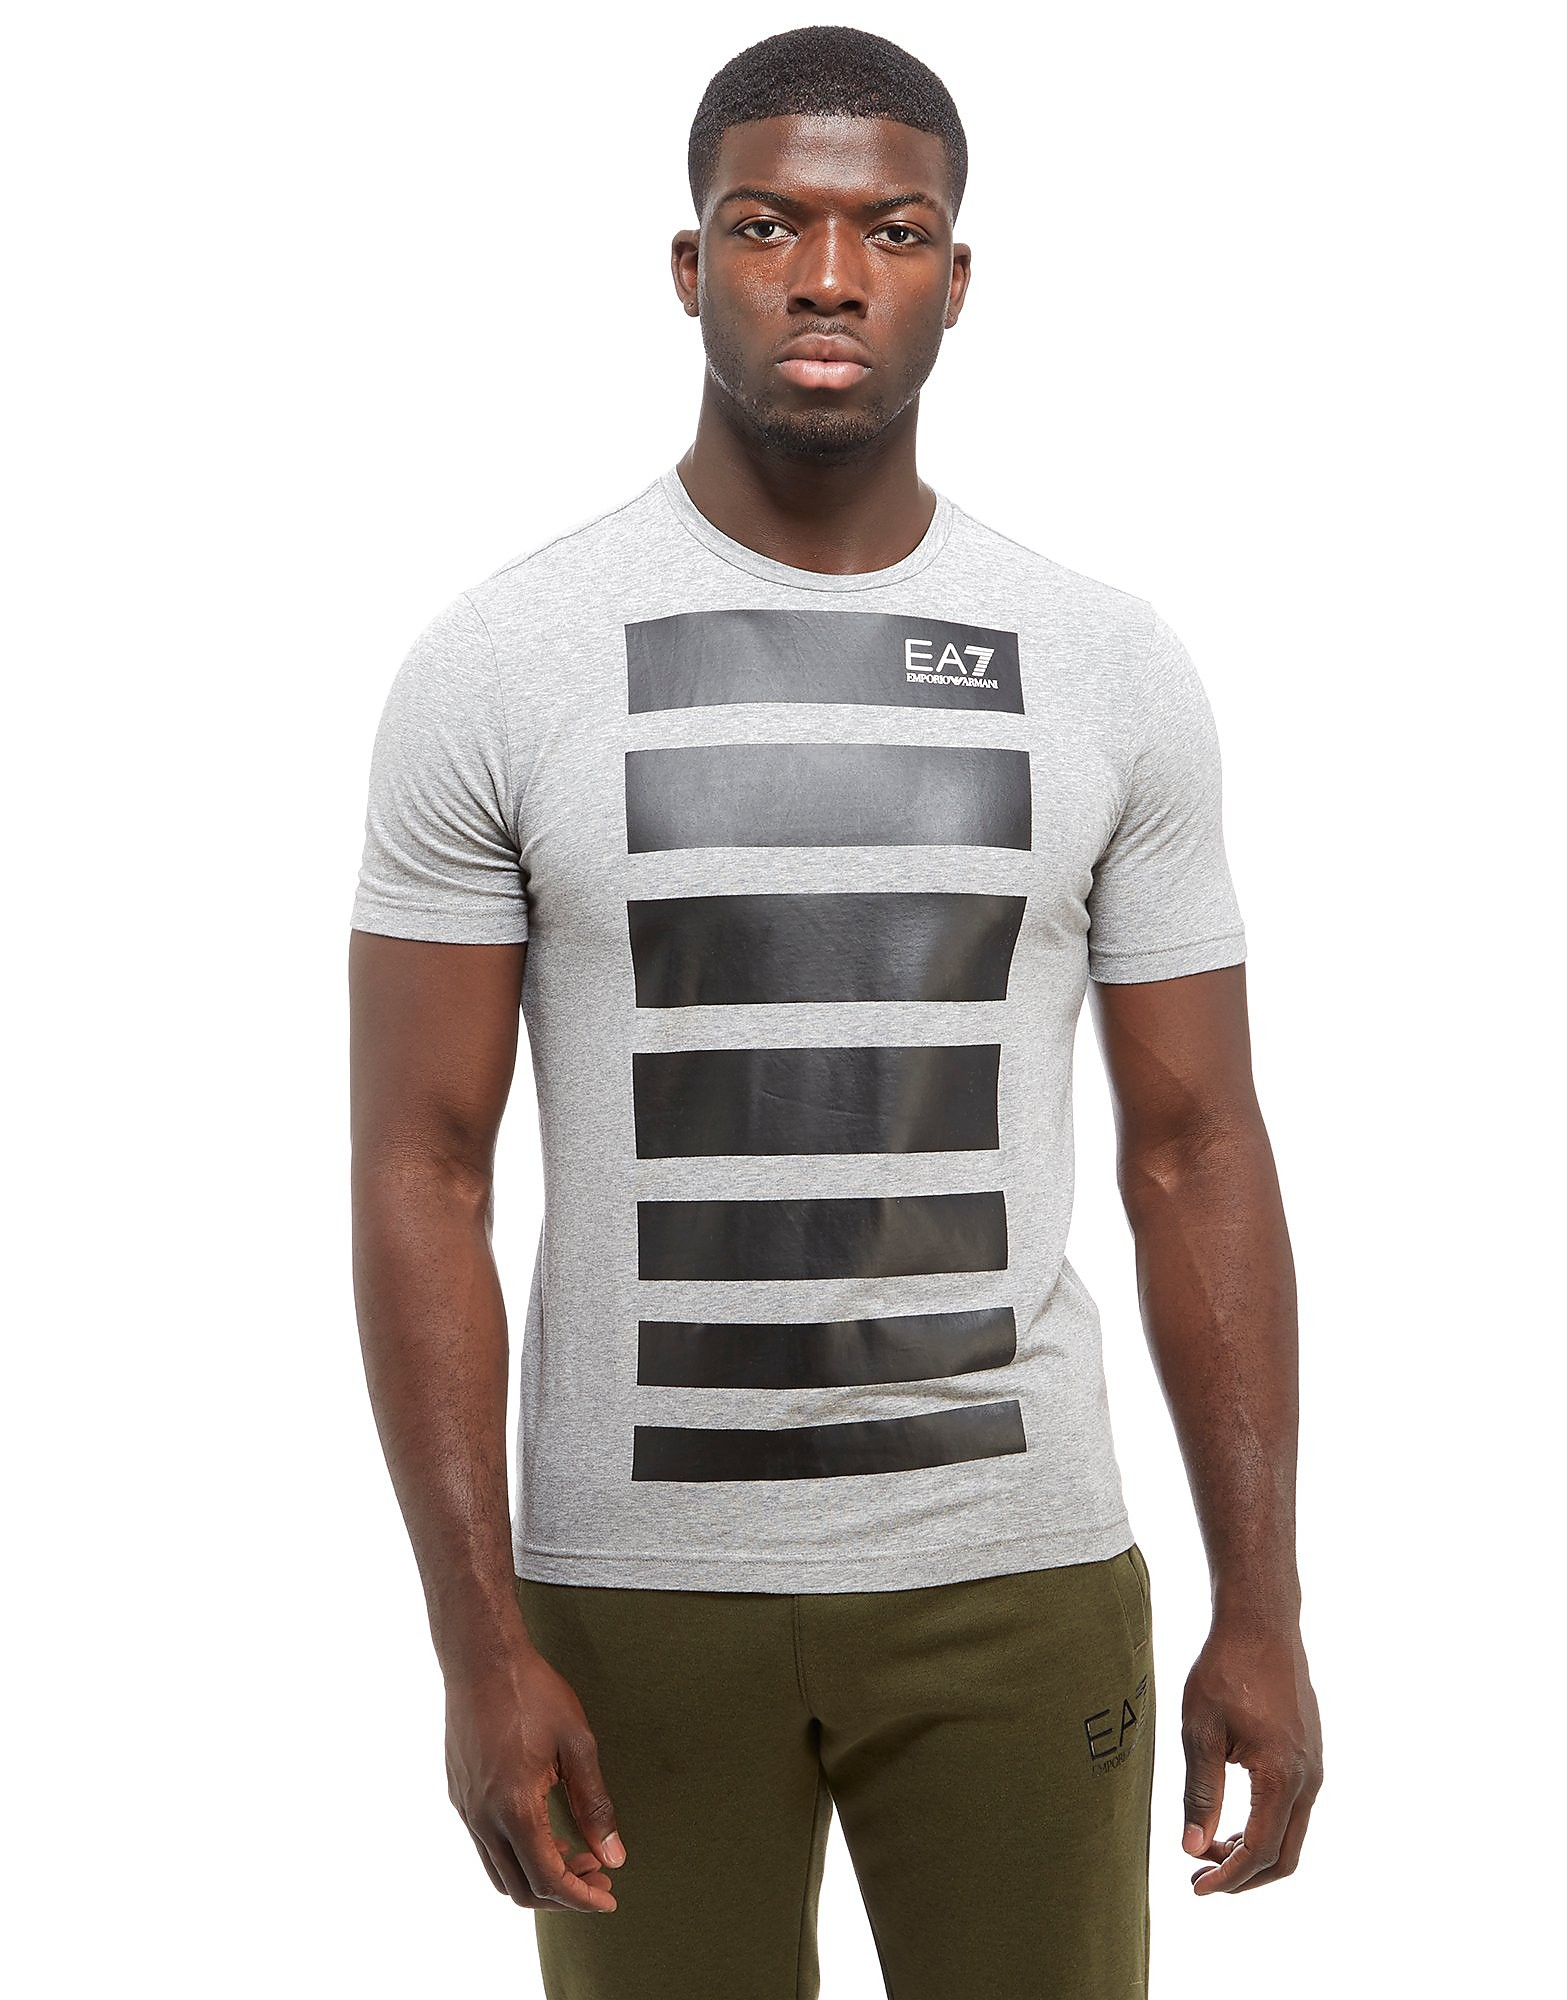 Emporio Armani EA7 7 Lines T-Shirt Heren